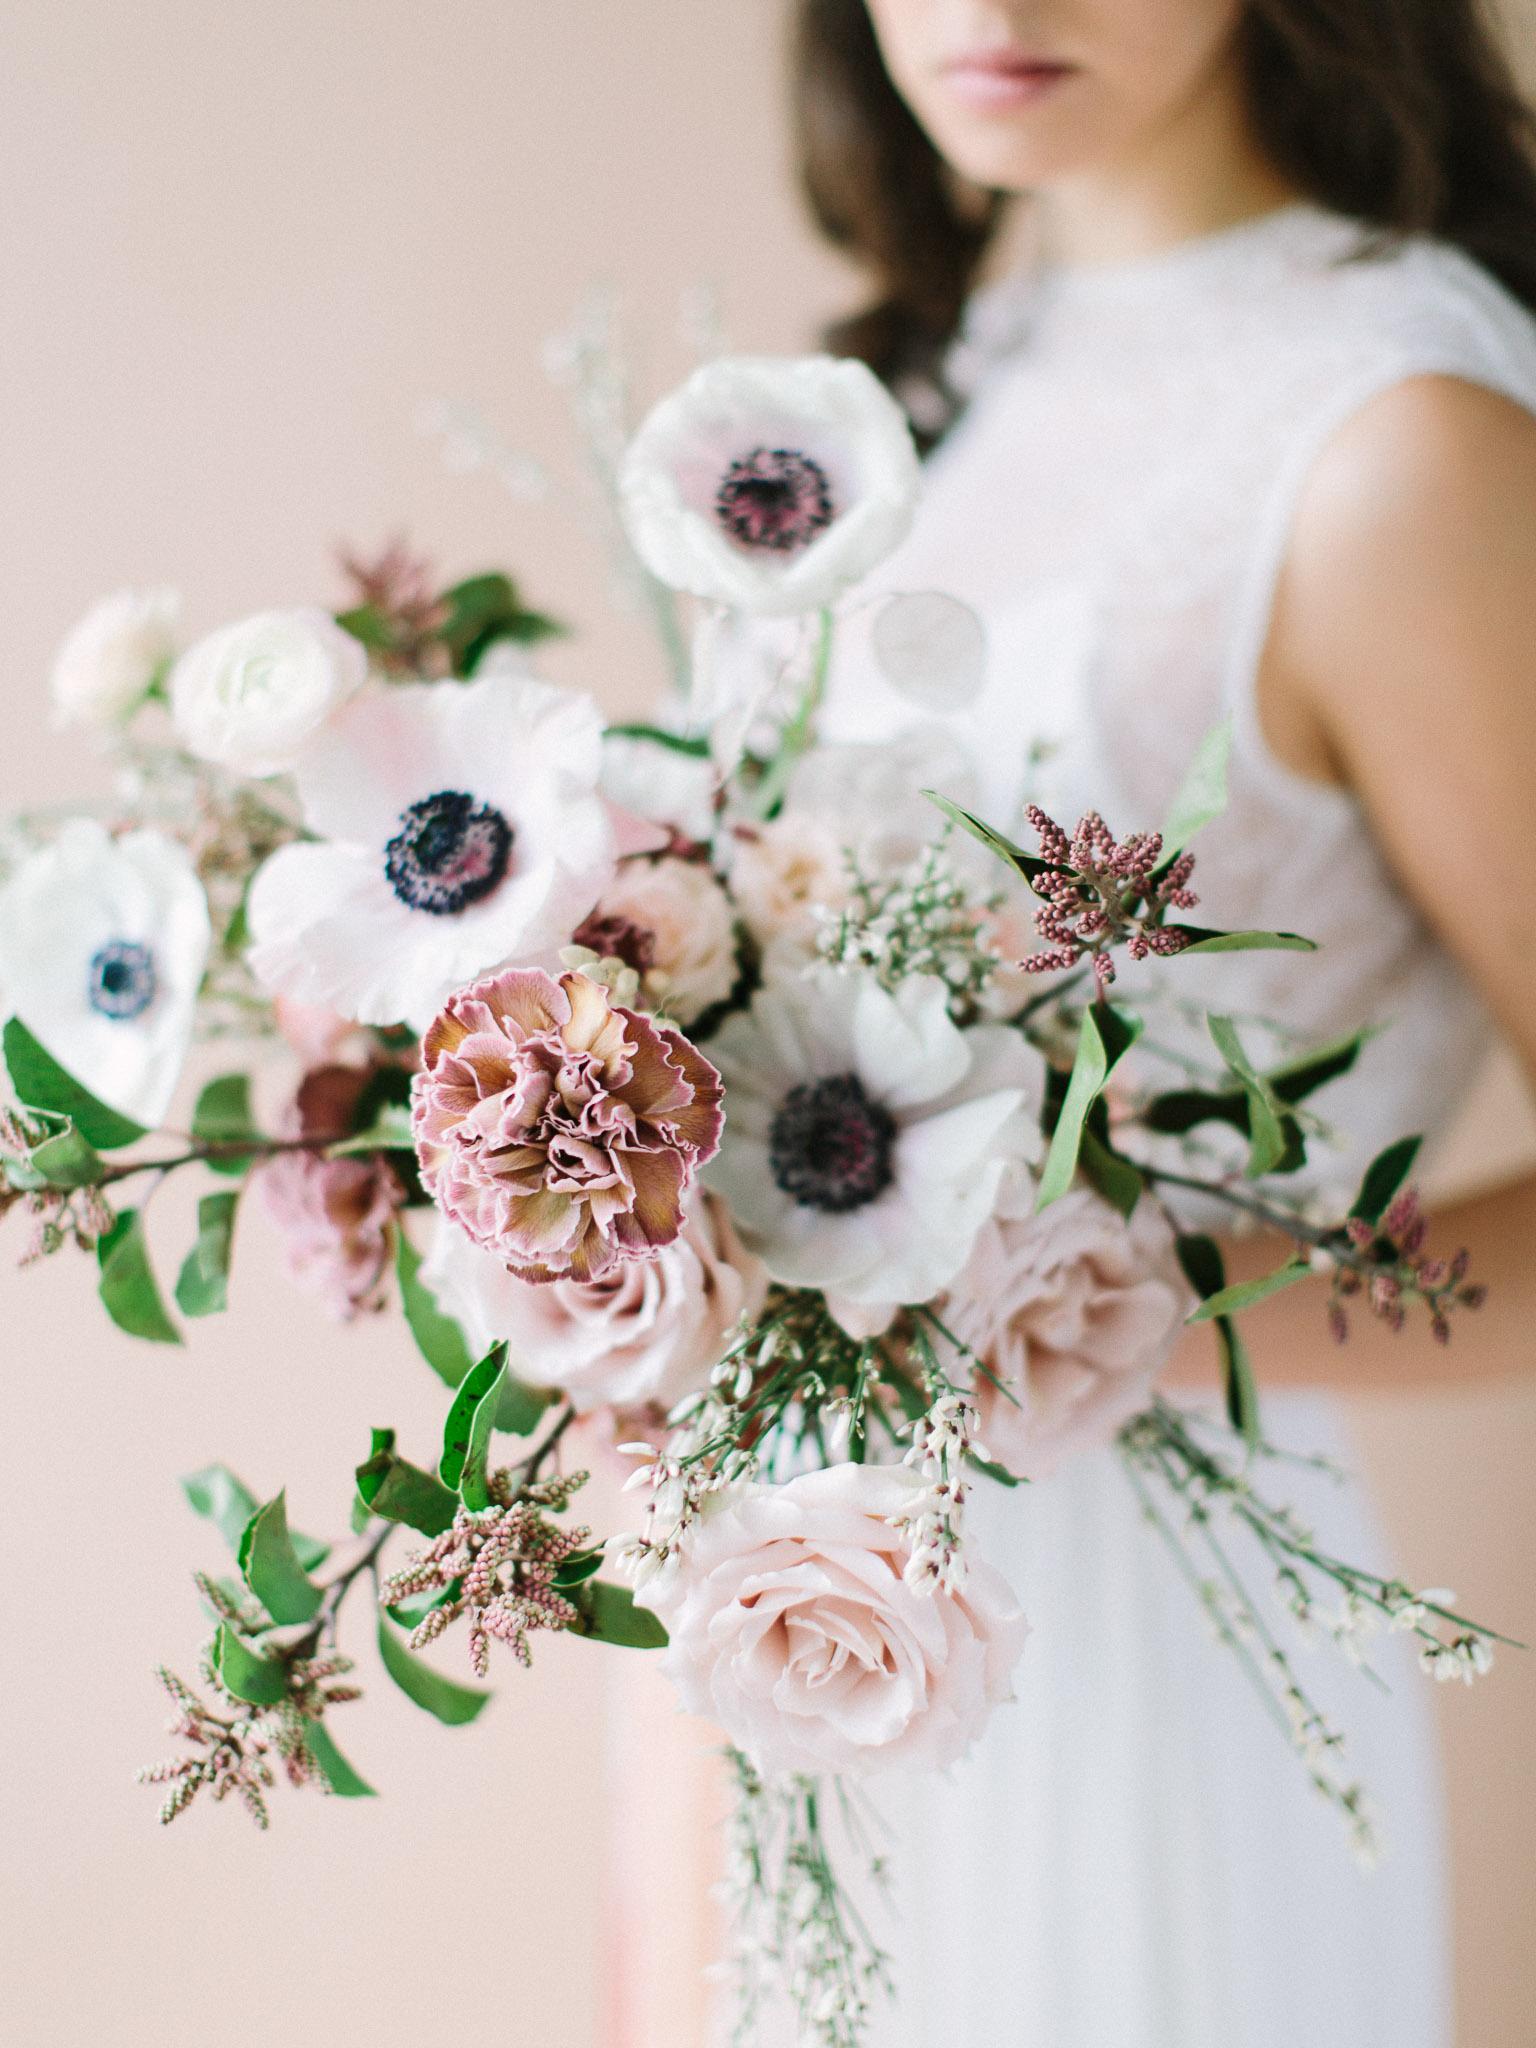 ModernNaturalStyledShoot_MaricleKang_Vancouver Wedding Photographer__0037.jpg